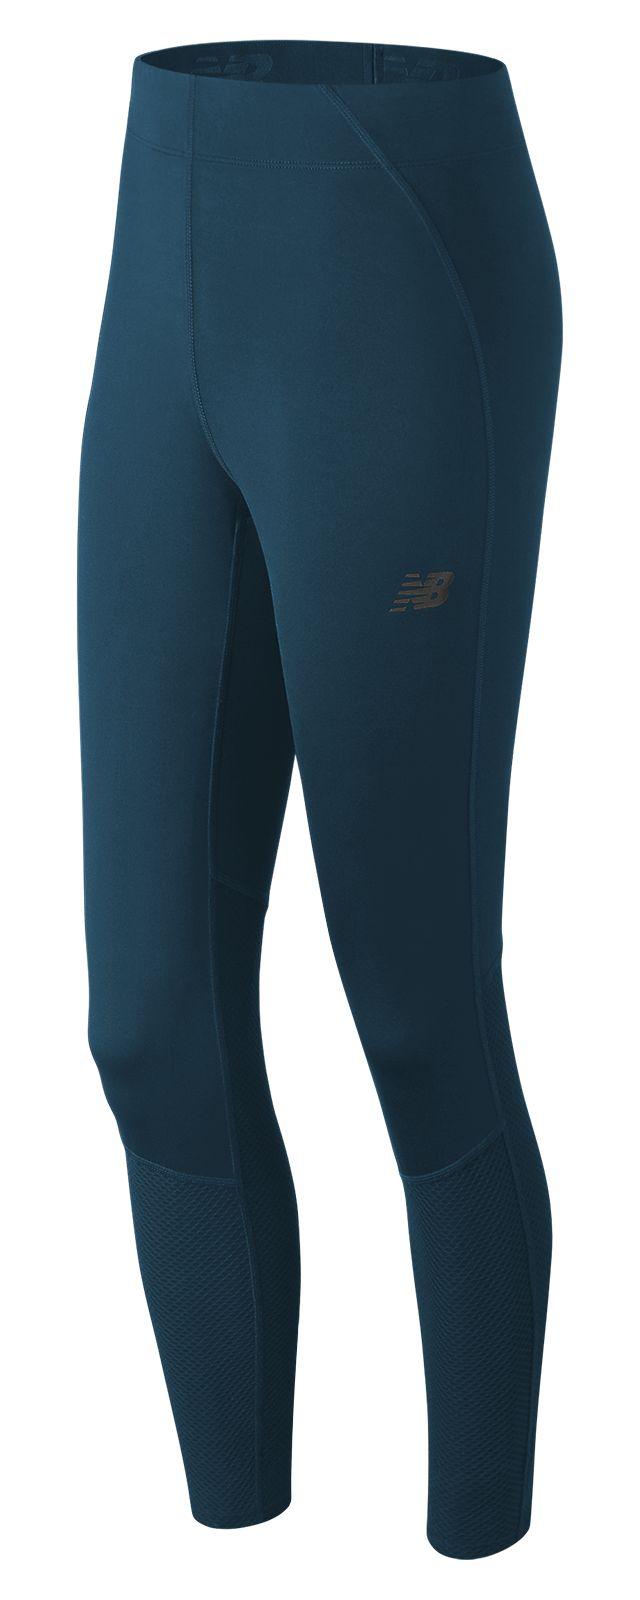 Women's 247 Luxe Legging